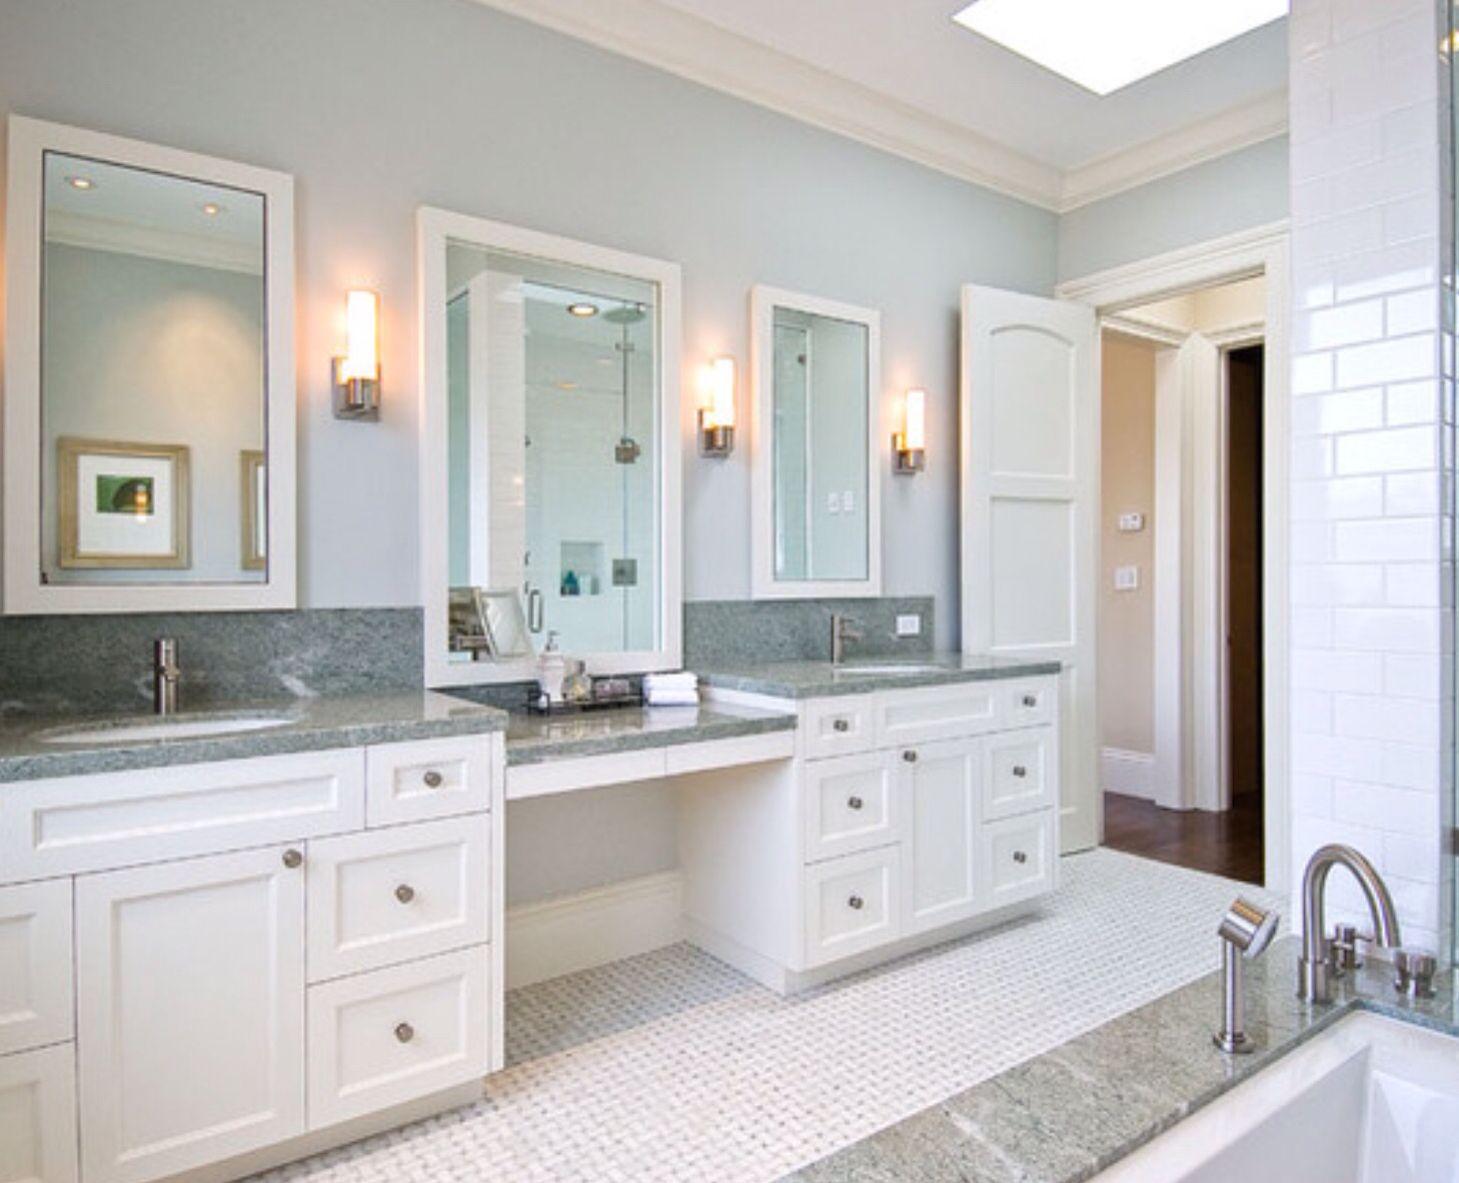 Makeup and cabinets | Master bath vanity, Grey bathrooms ...